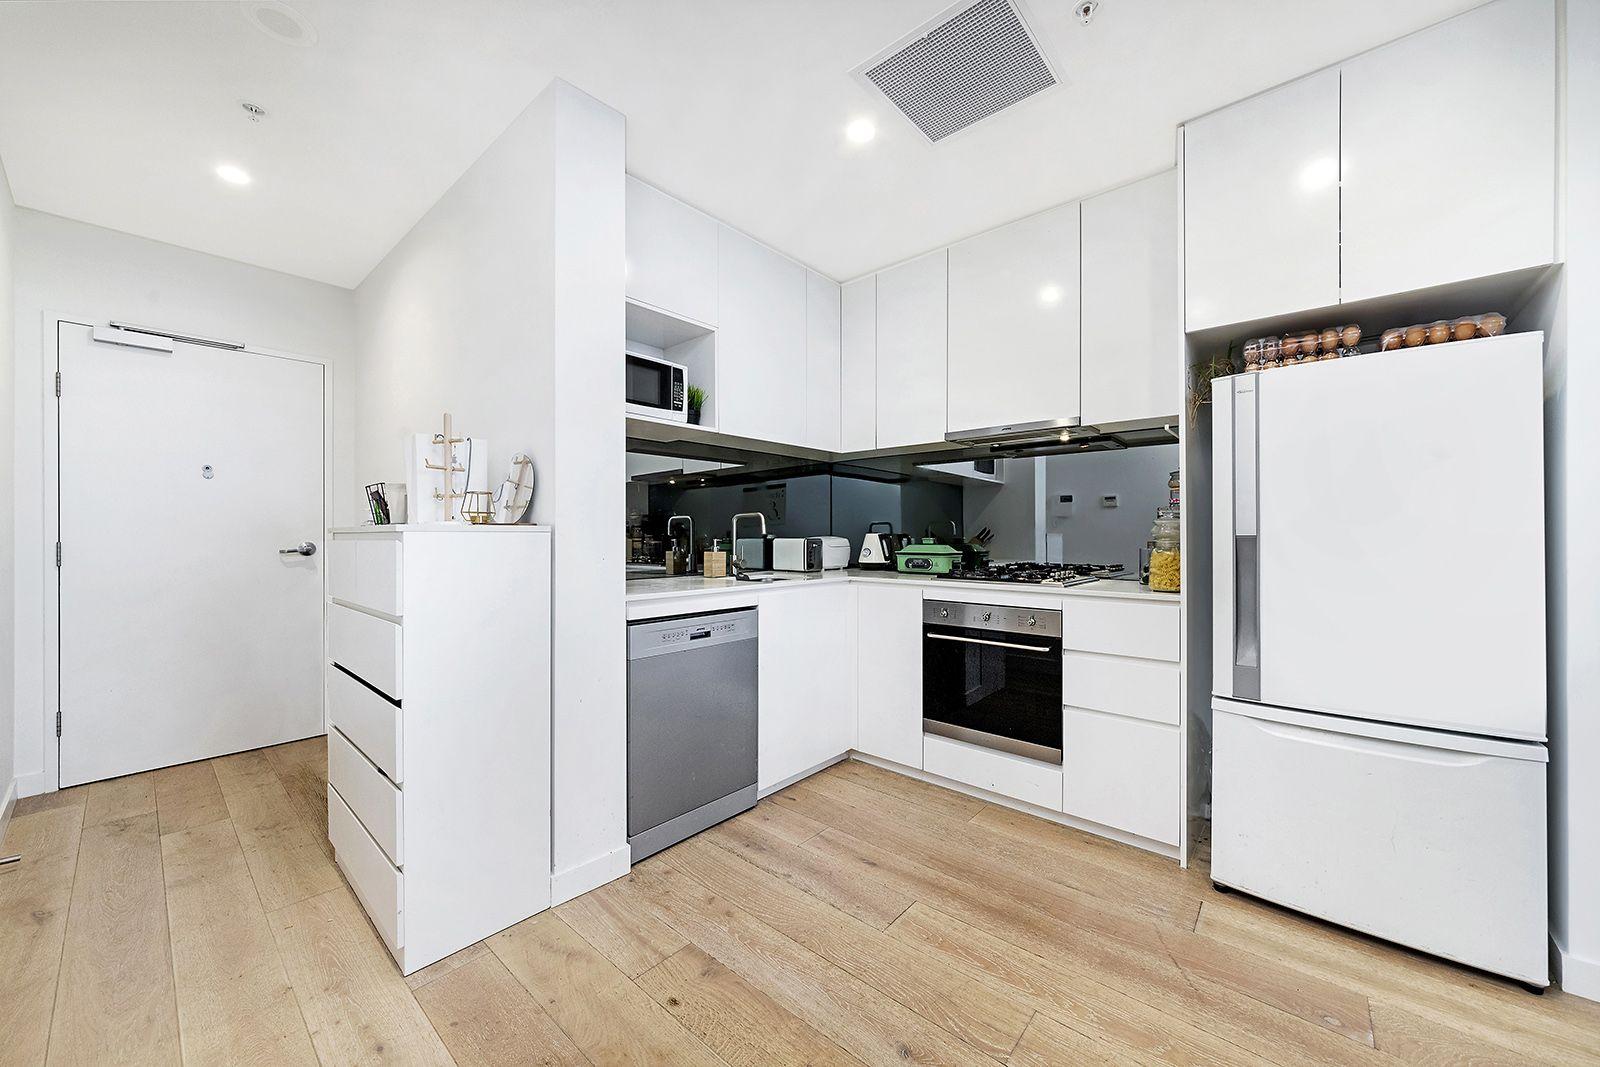 B1103/22-28 Cambridge Street, Epping NSW 2121, Image 2